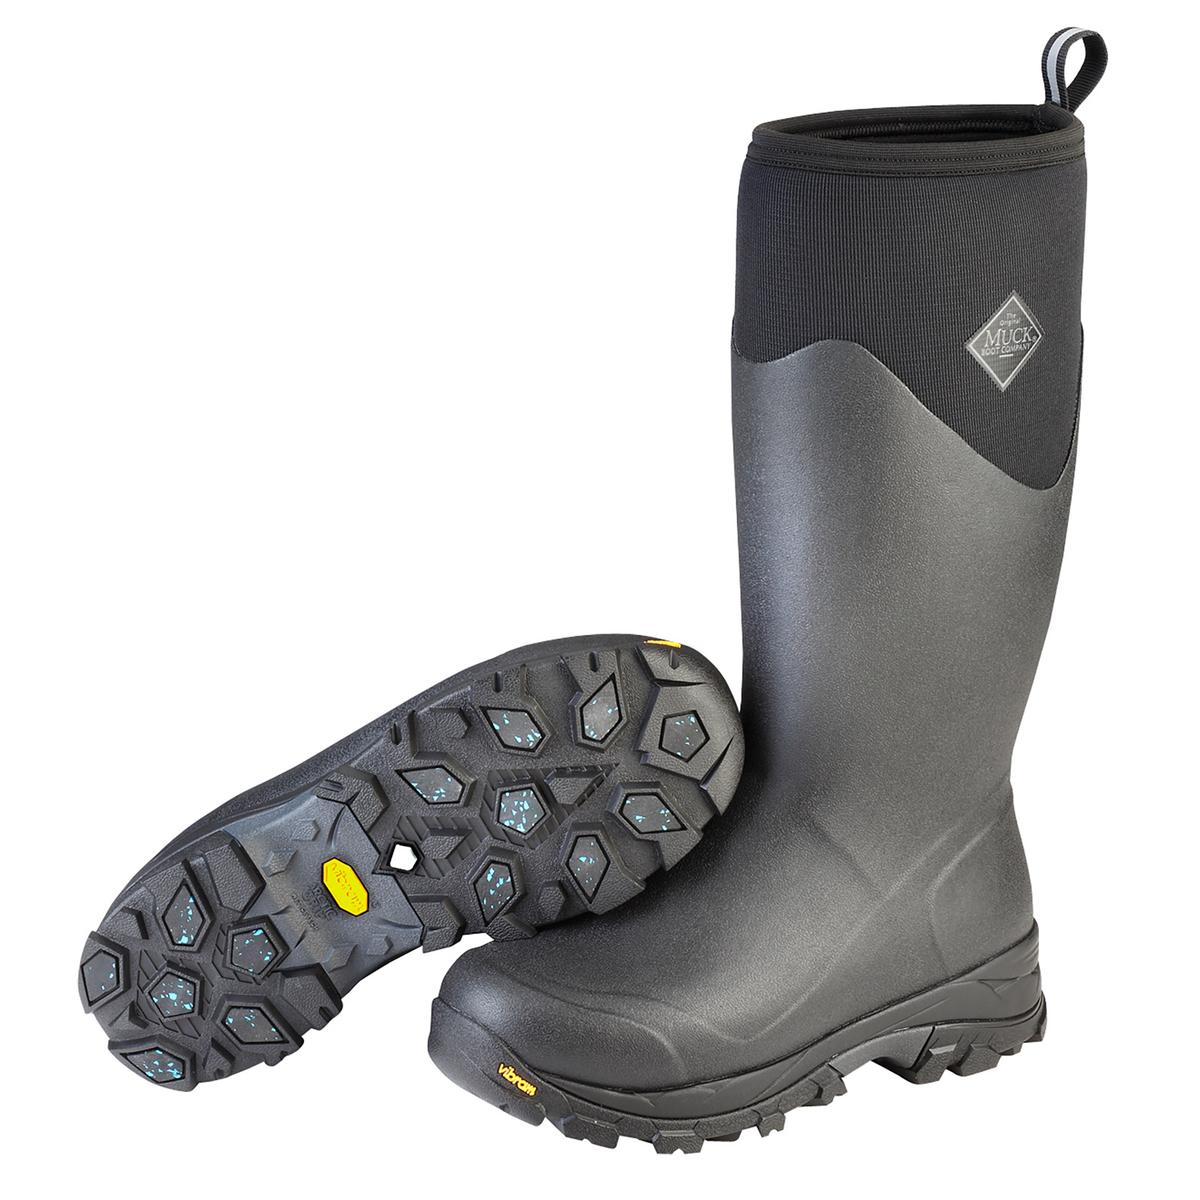 f0f36e29 Muck Boot Arctic Ice, høy, mann | Horze